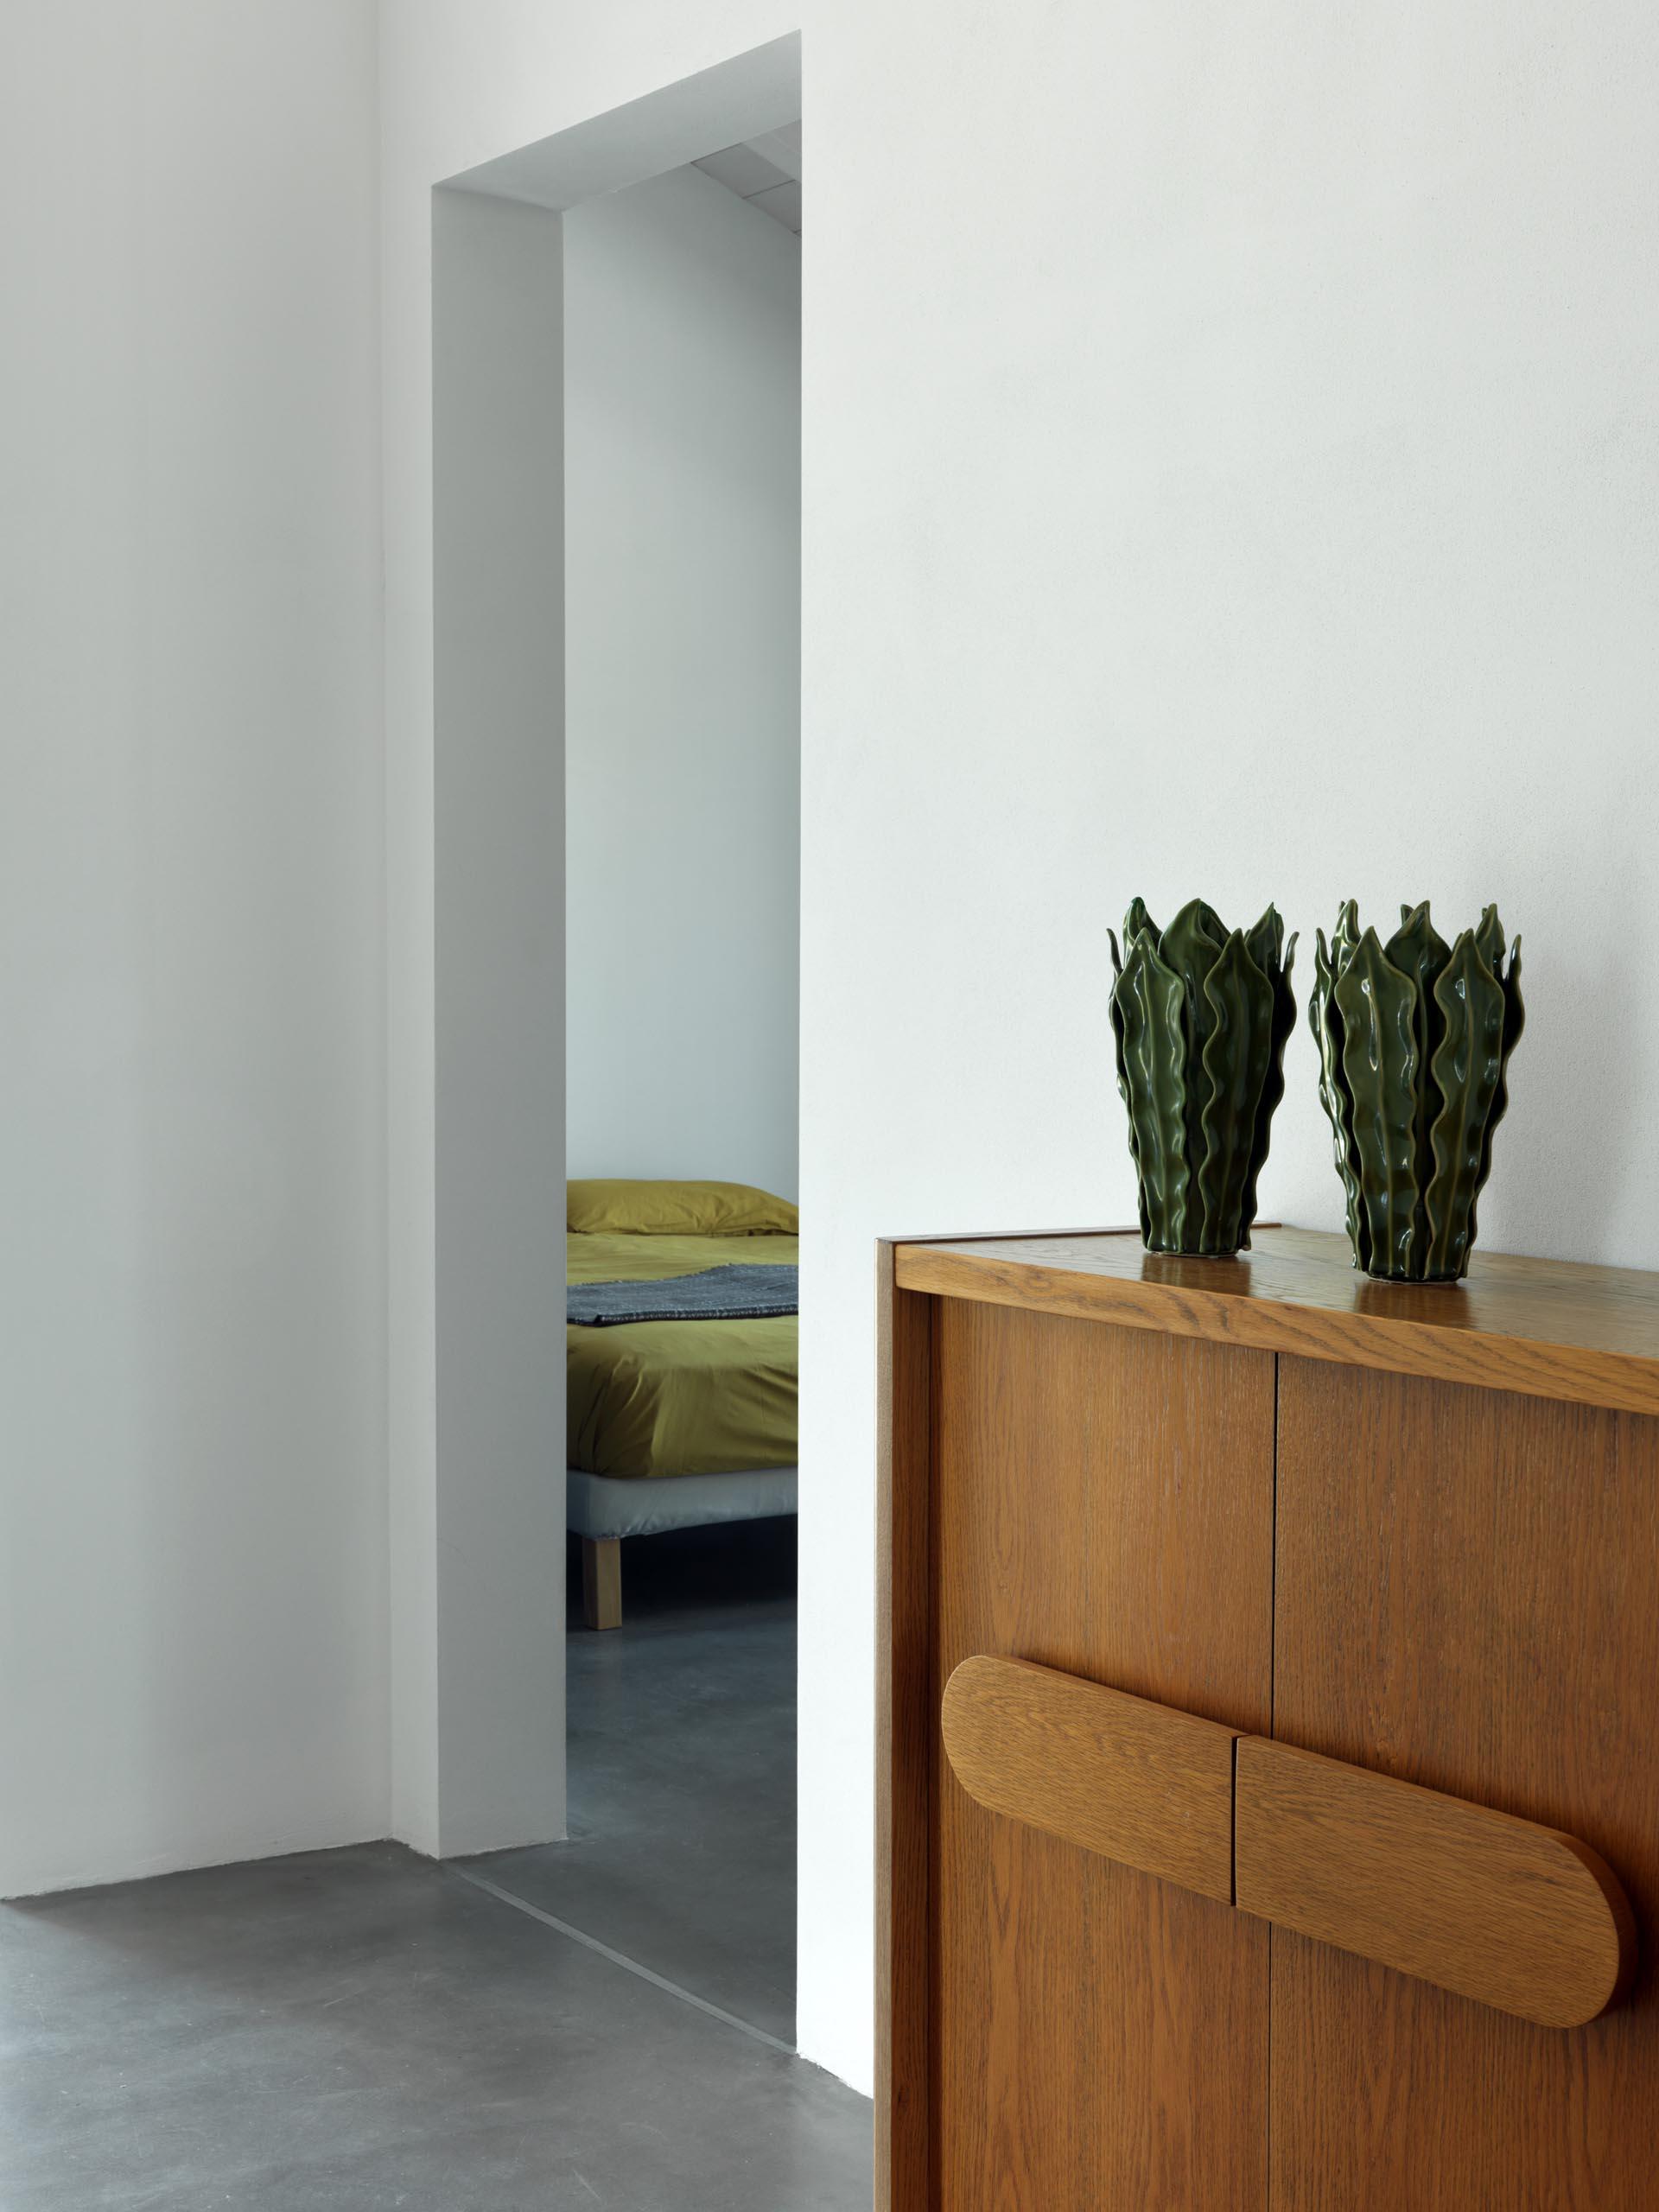 A modern farmhouse that's minimally furnished.